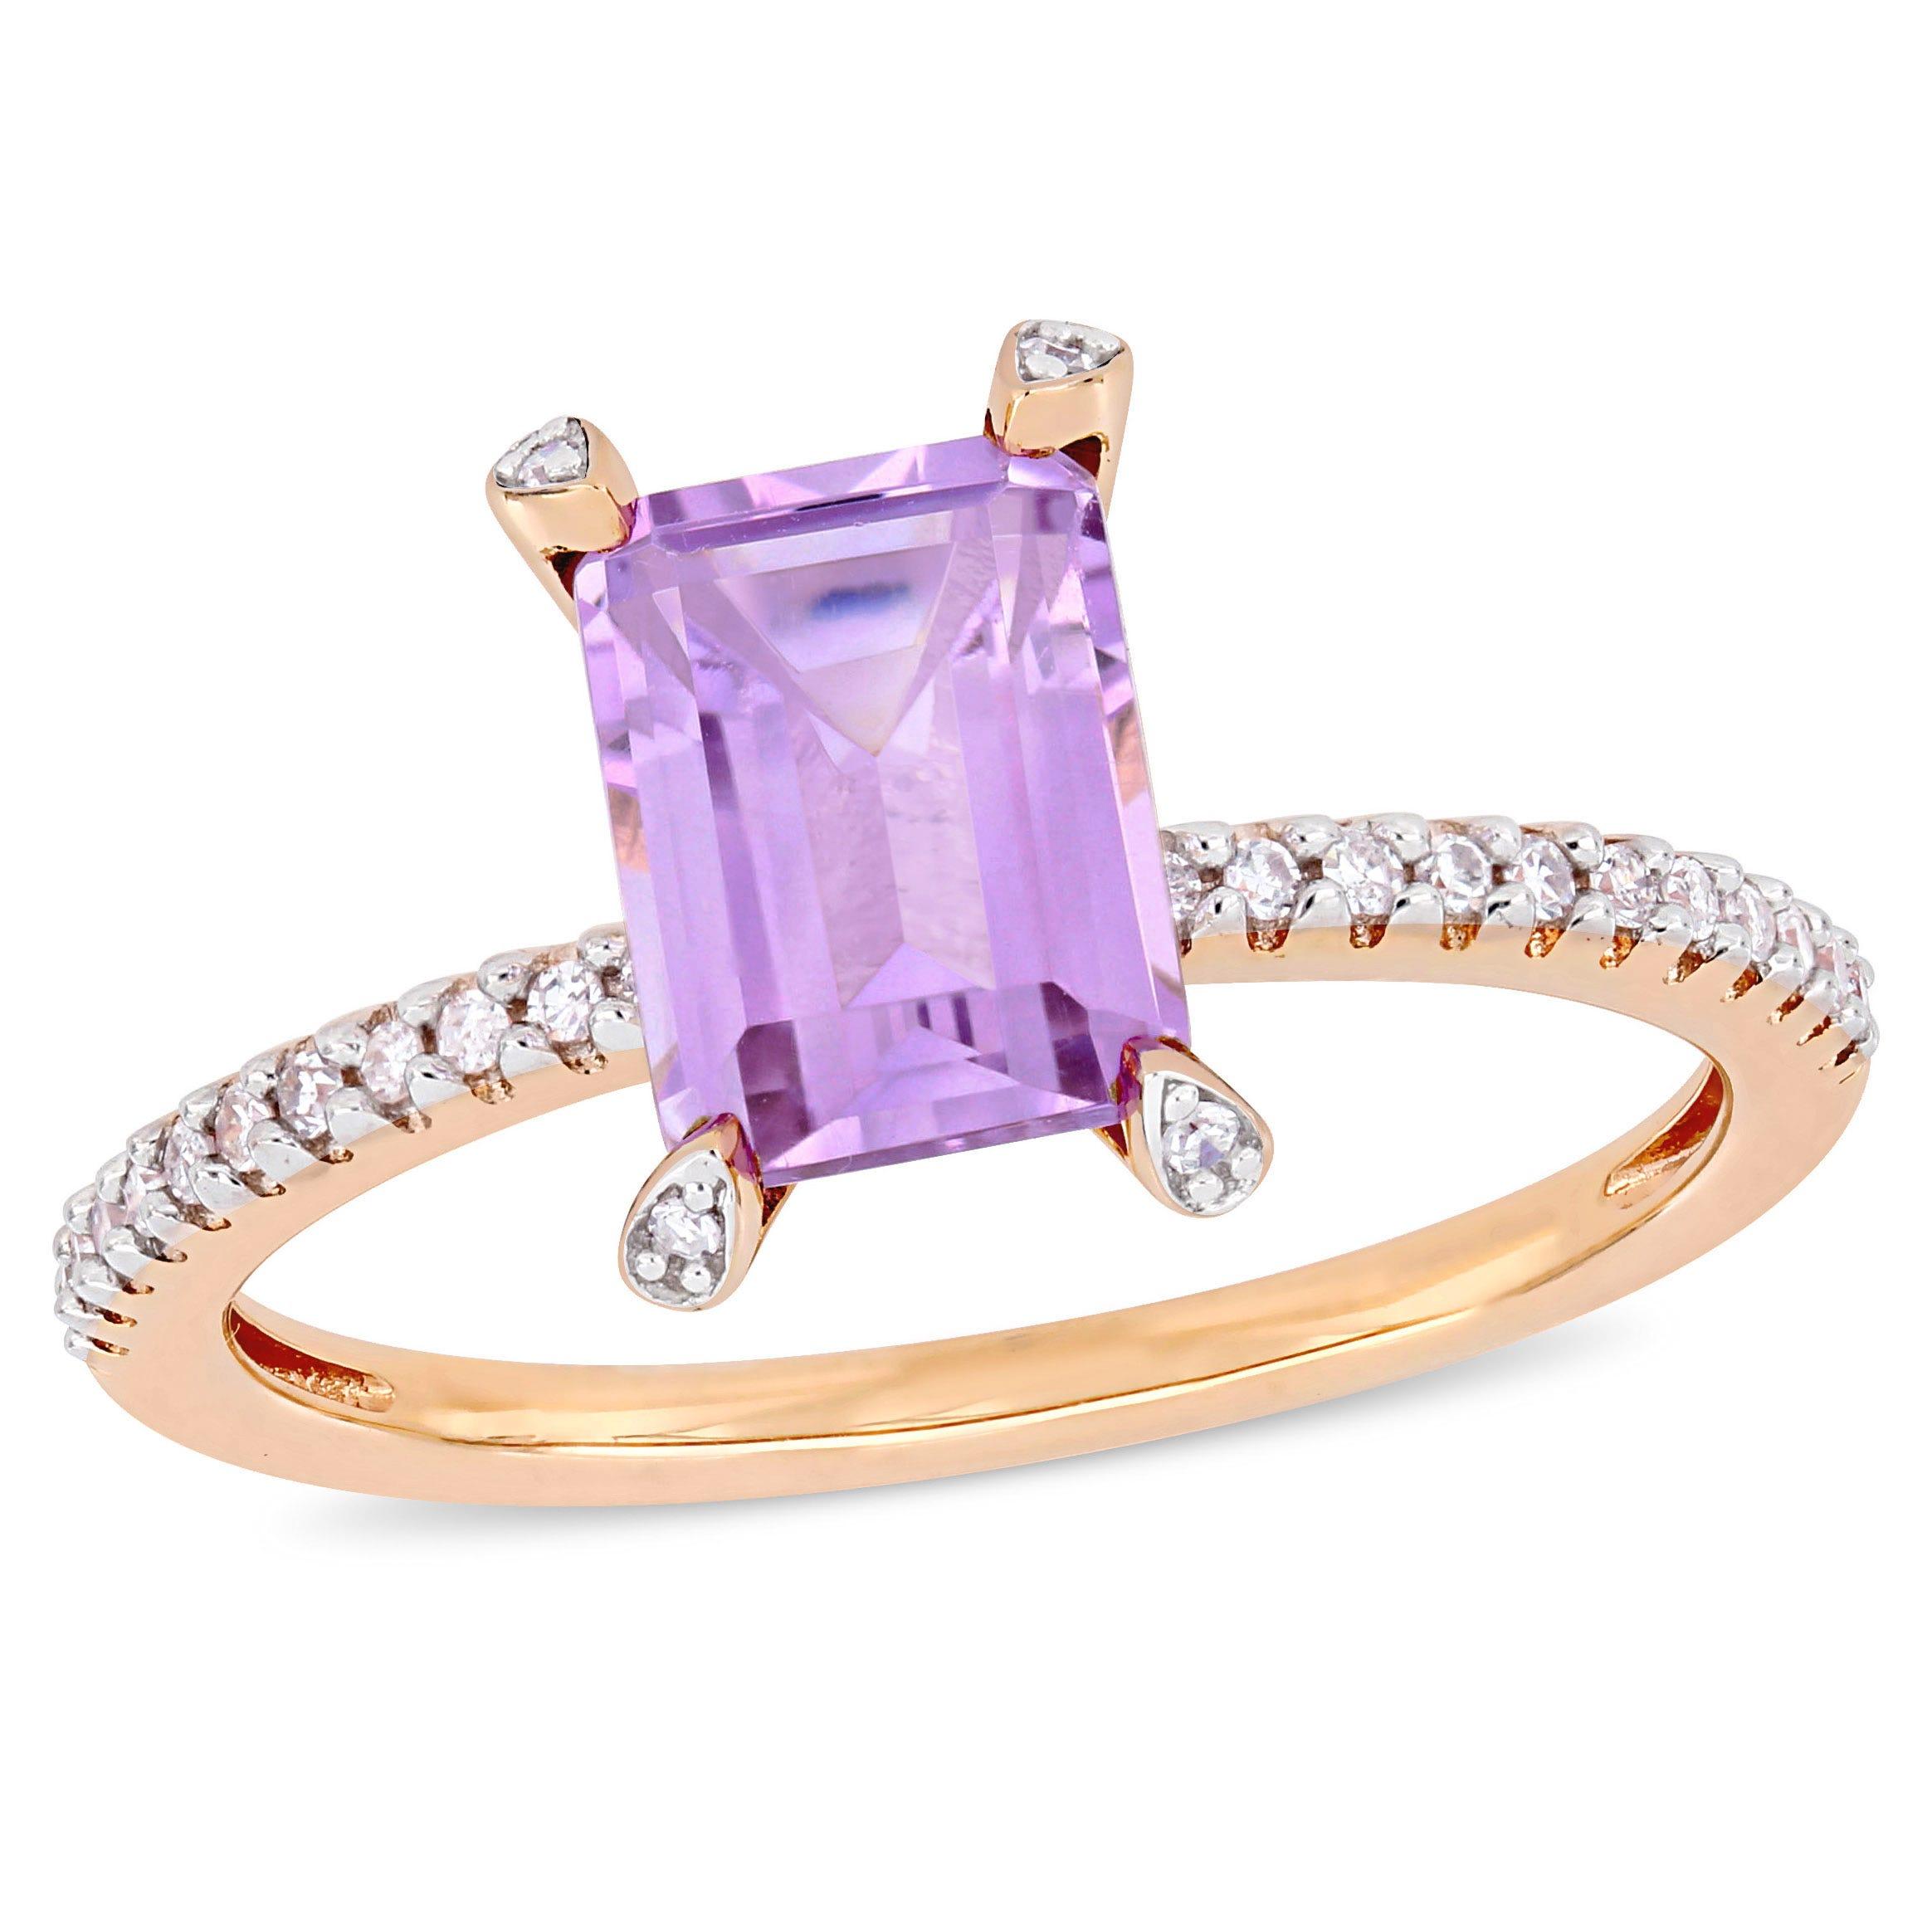 Emerald-Cut Rose De France Gemstone Solitaire Engagement Ring in 10k Rose Gold